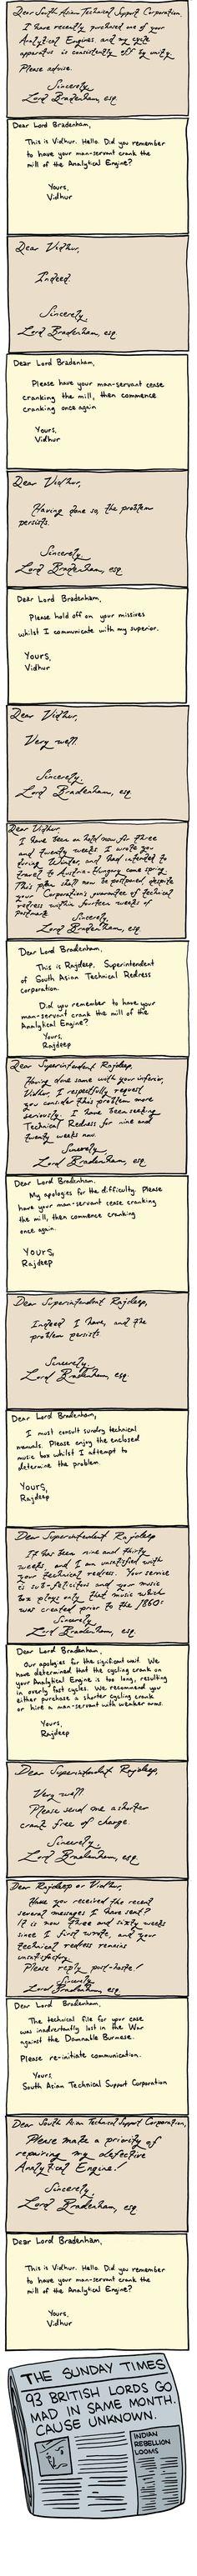 http://www.smbc-comics.com/?db=comics&id=2247#comic  This comic is hilarious.